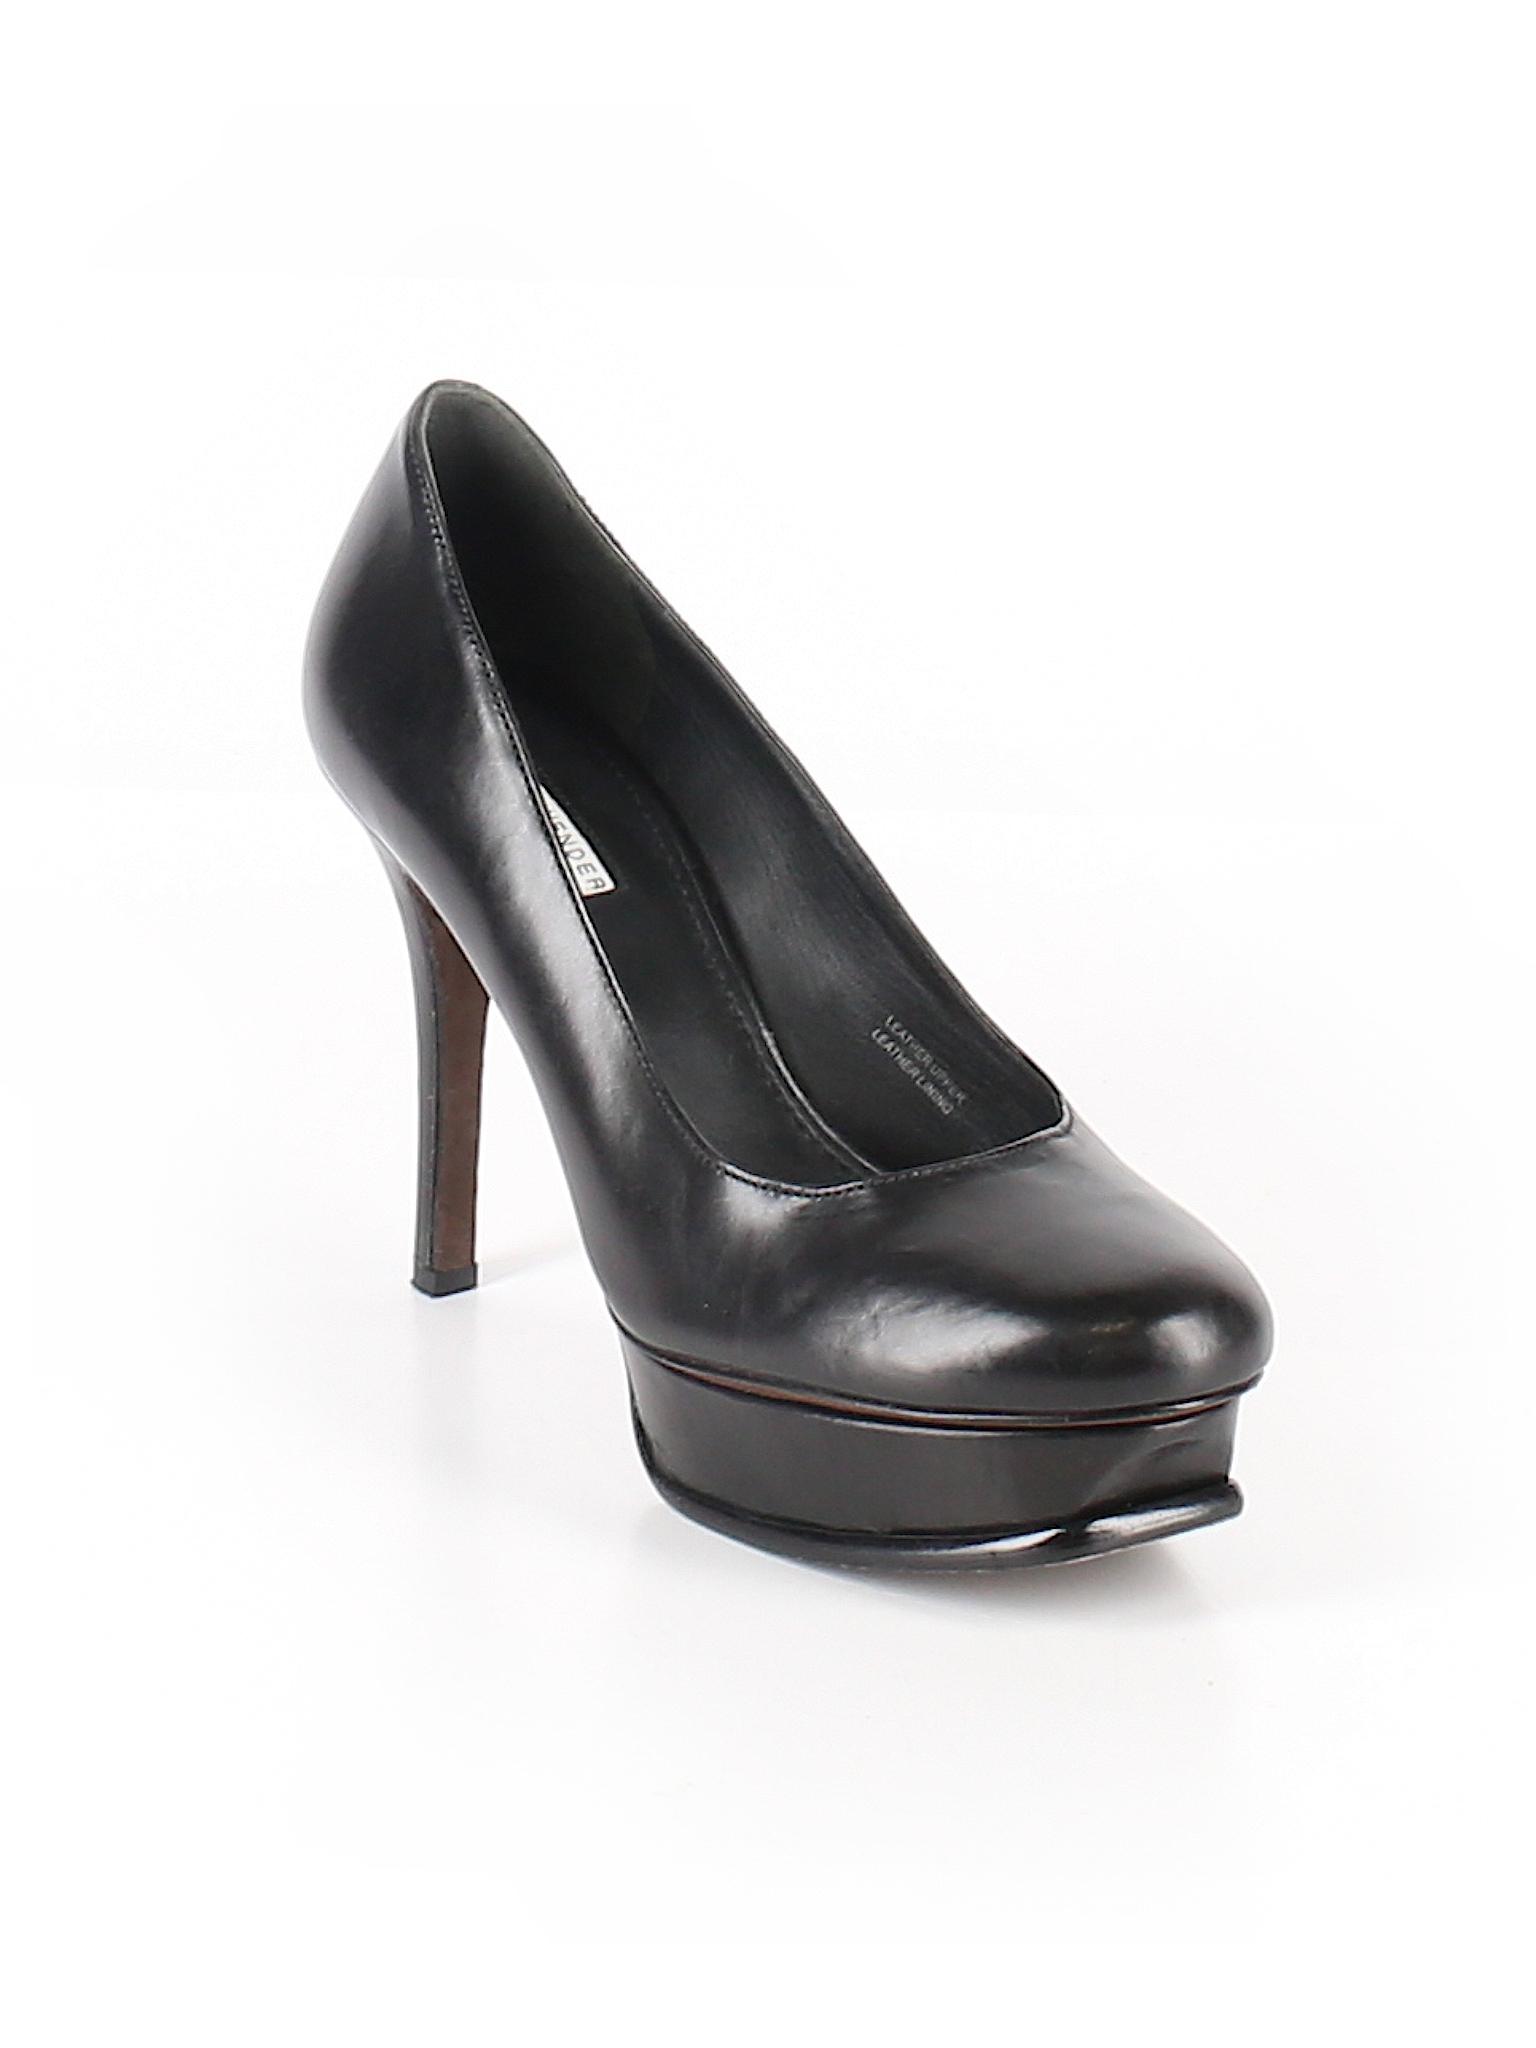 Vera Boutique promotion Heels Wang by Lavender Label raIwqza